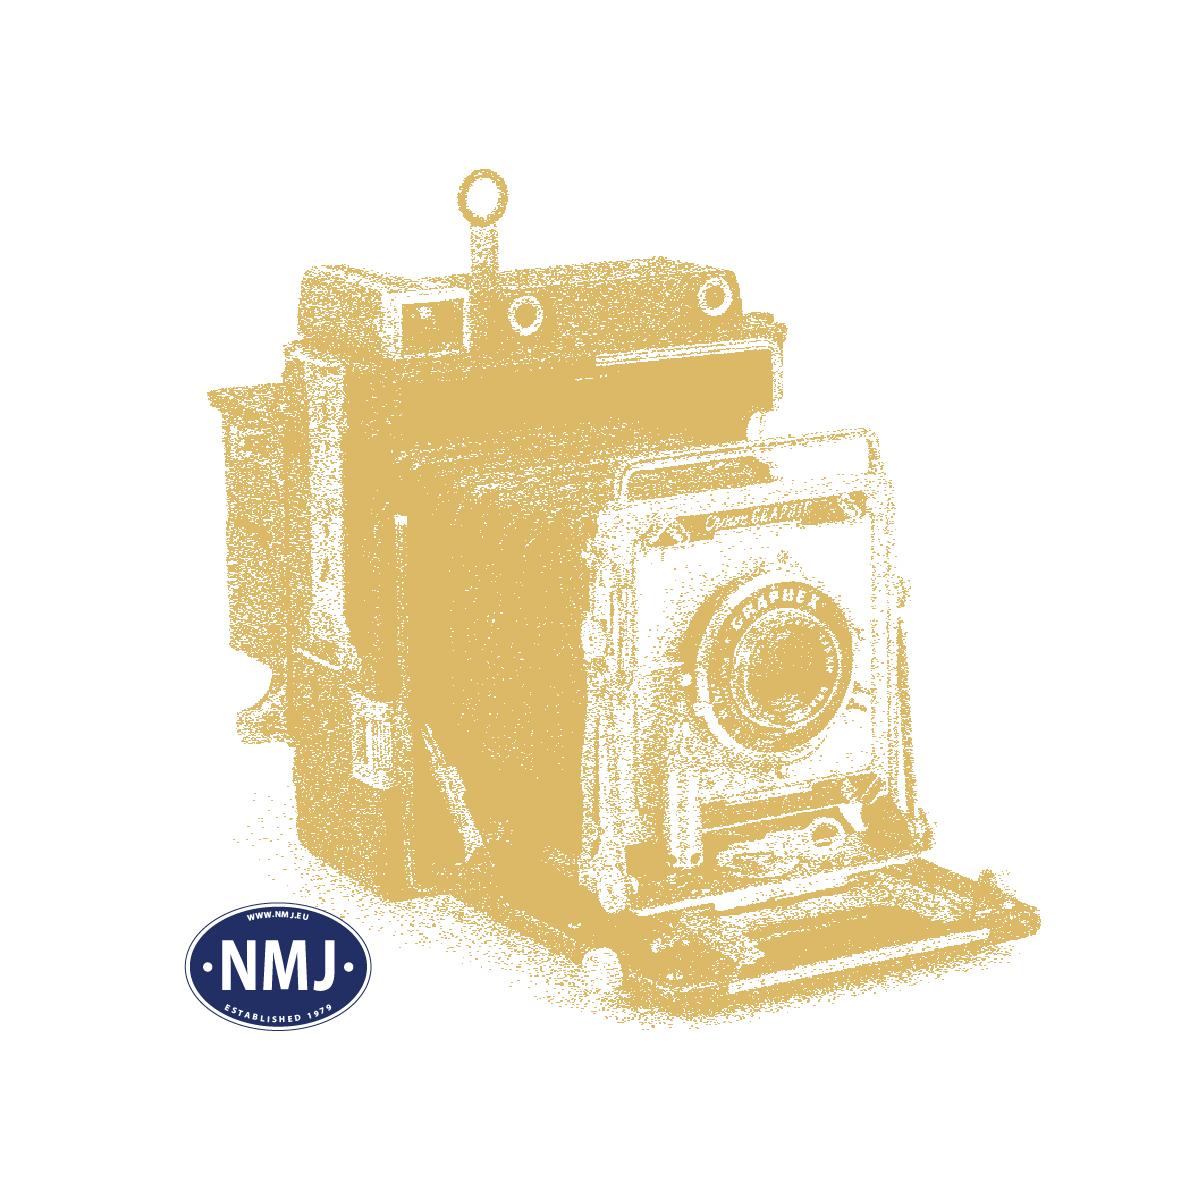 MBR55-1002 - Gressmatte #2, 30 x 40 Cm